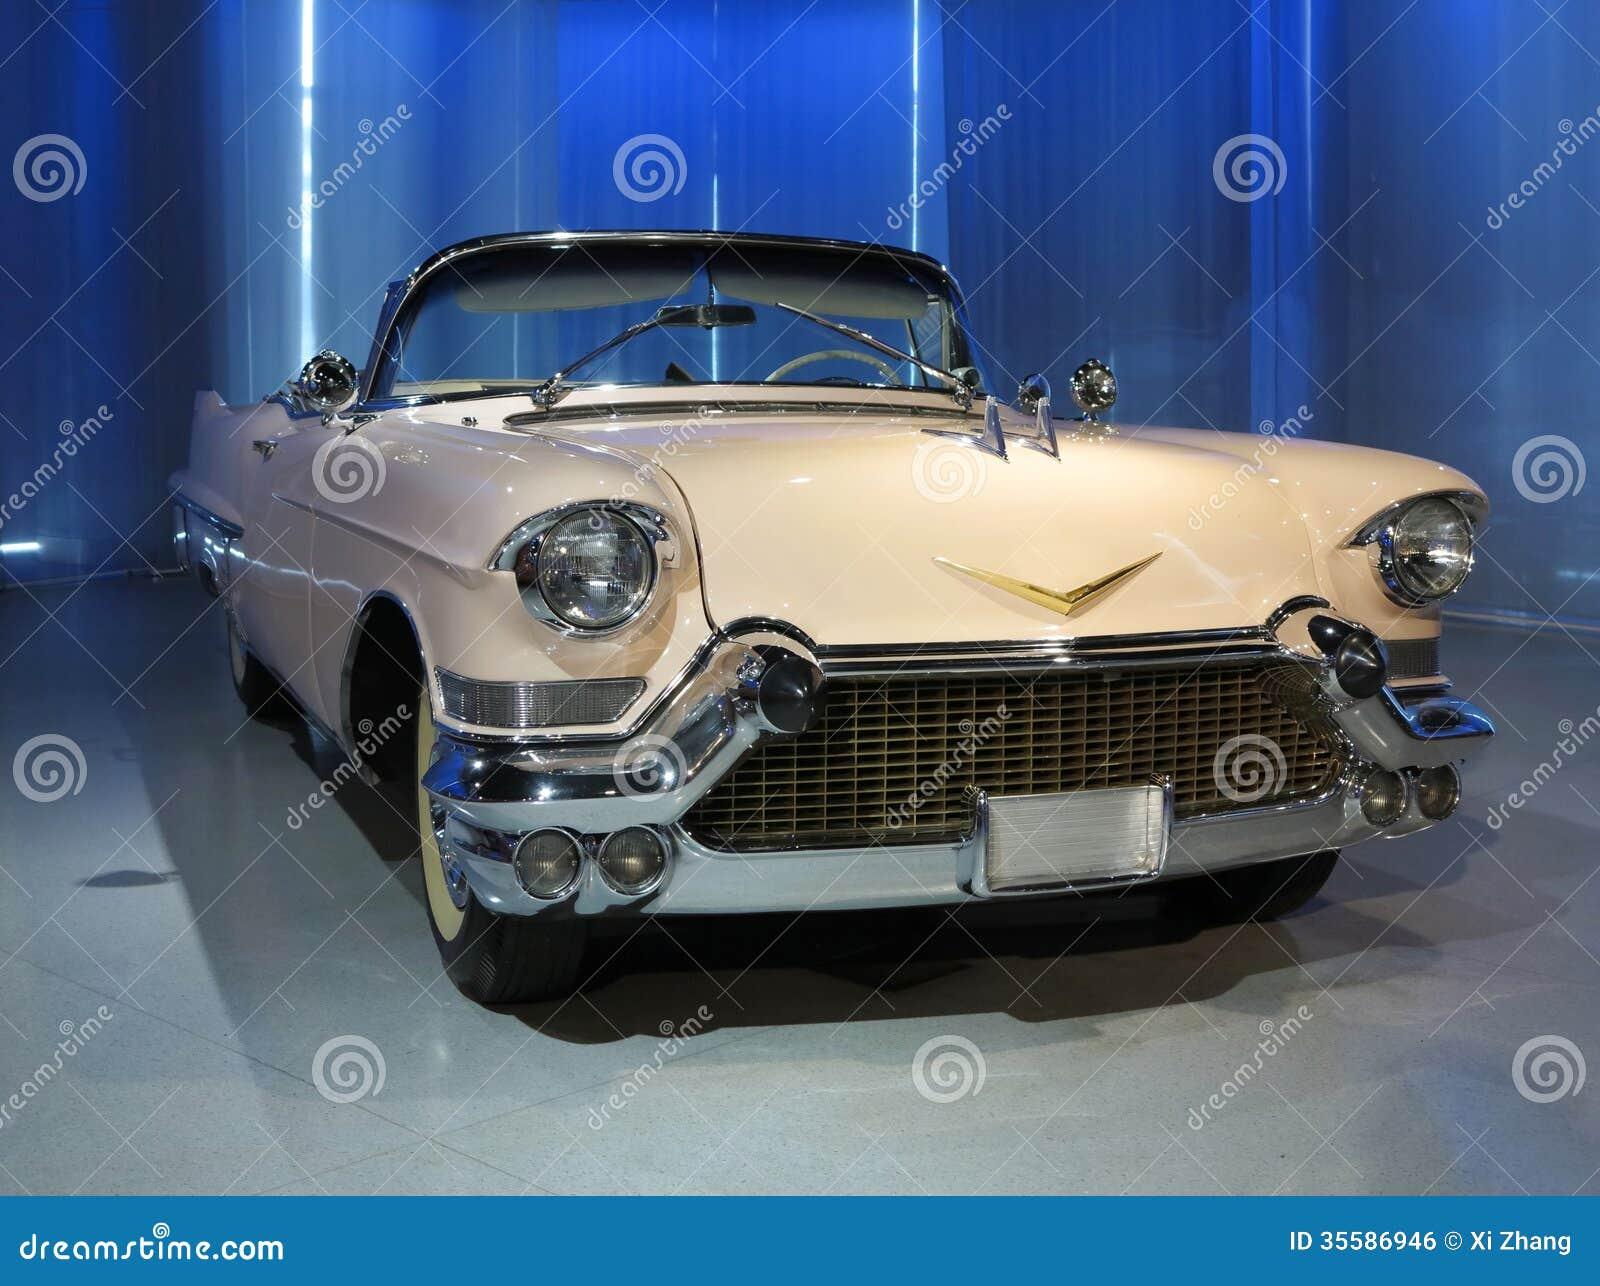 vieille voiture de cadillac stock images download 117 photos. Black Bedroom Furniture Sets. Home Design Ideas